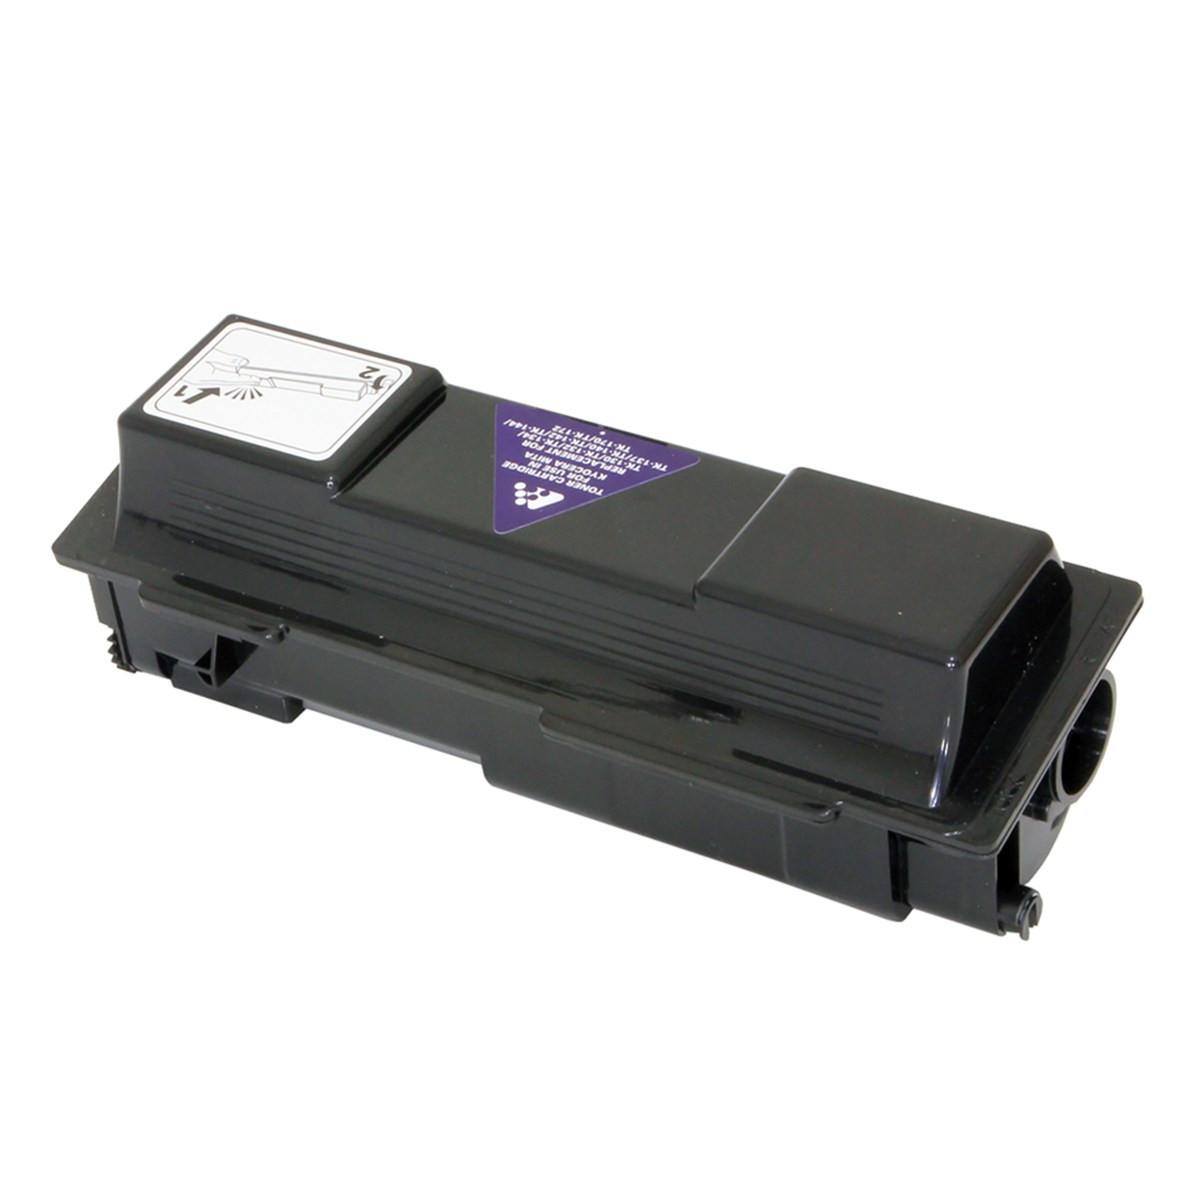 Toner Kyocera TK130 TK132 TK137 TK140 TK142 | FS1100 | SEM CHIP | Katun Performance